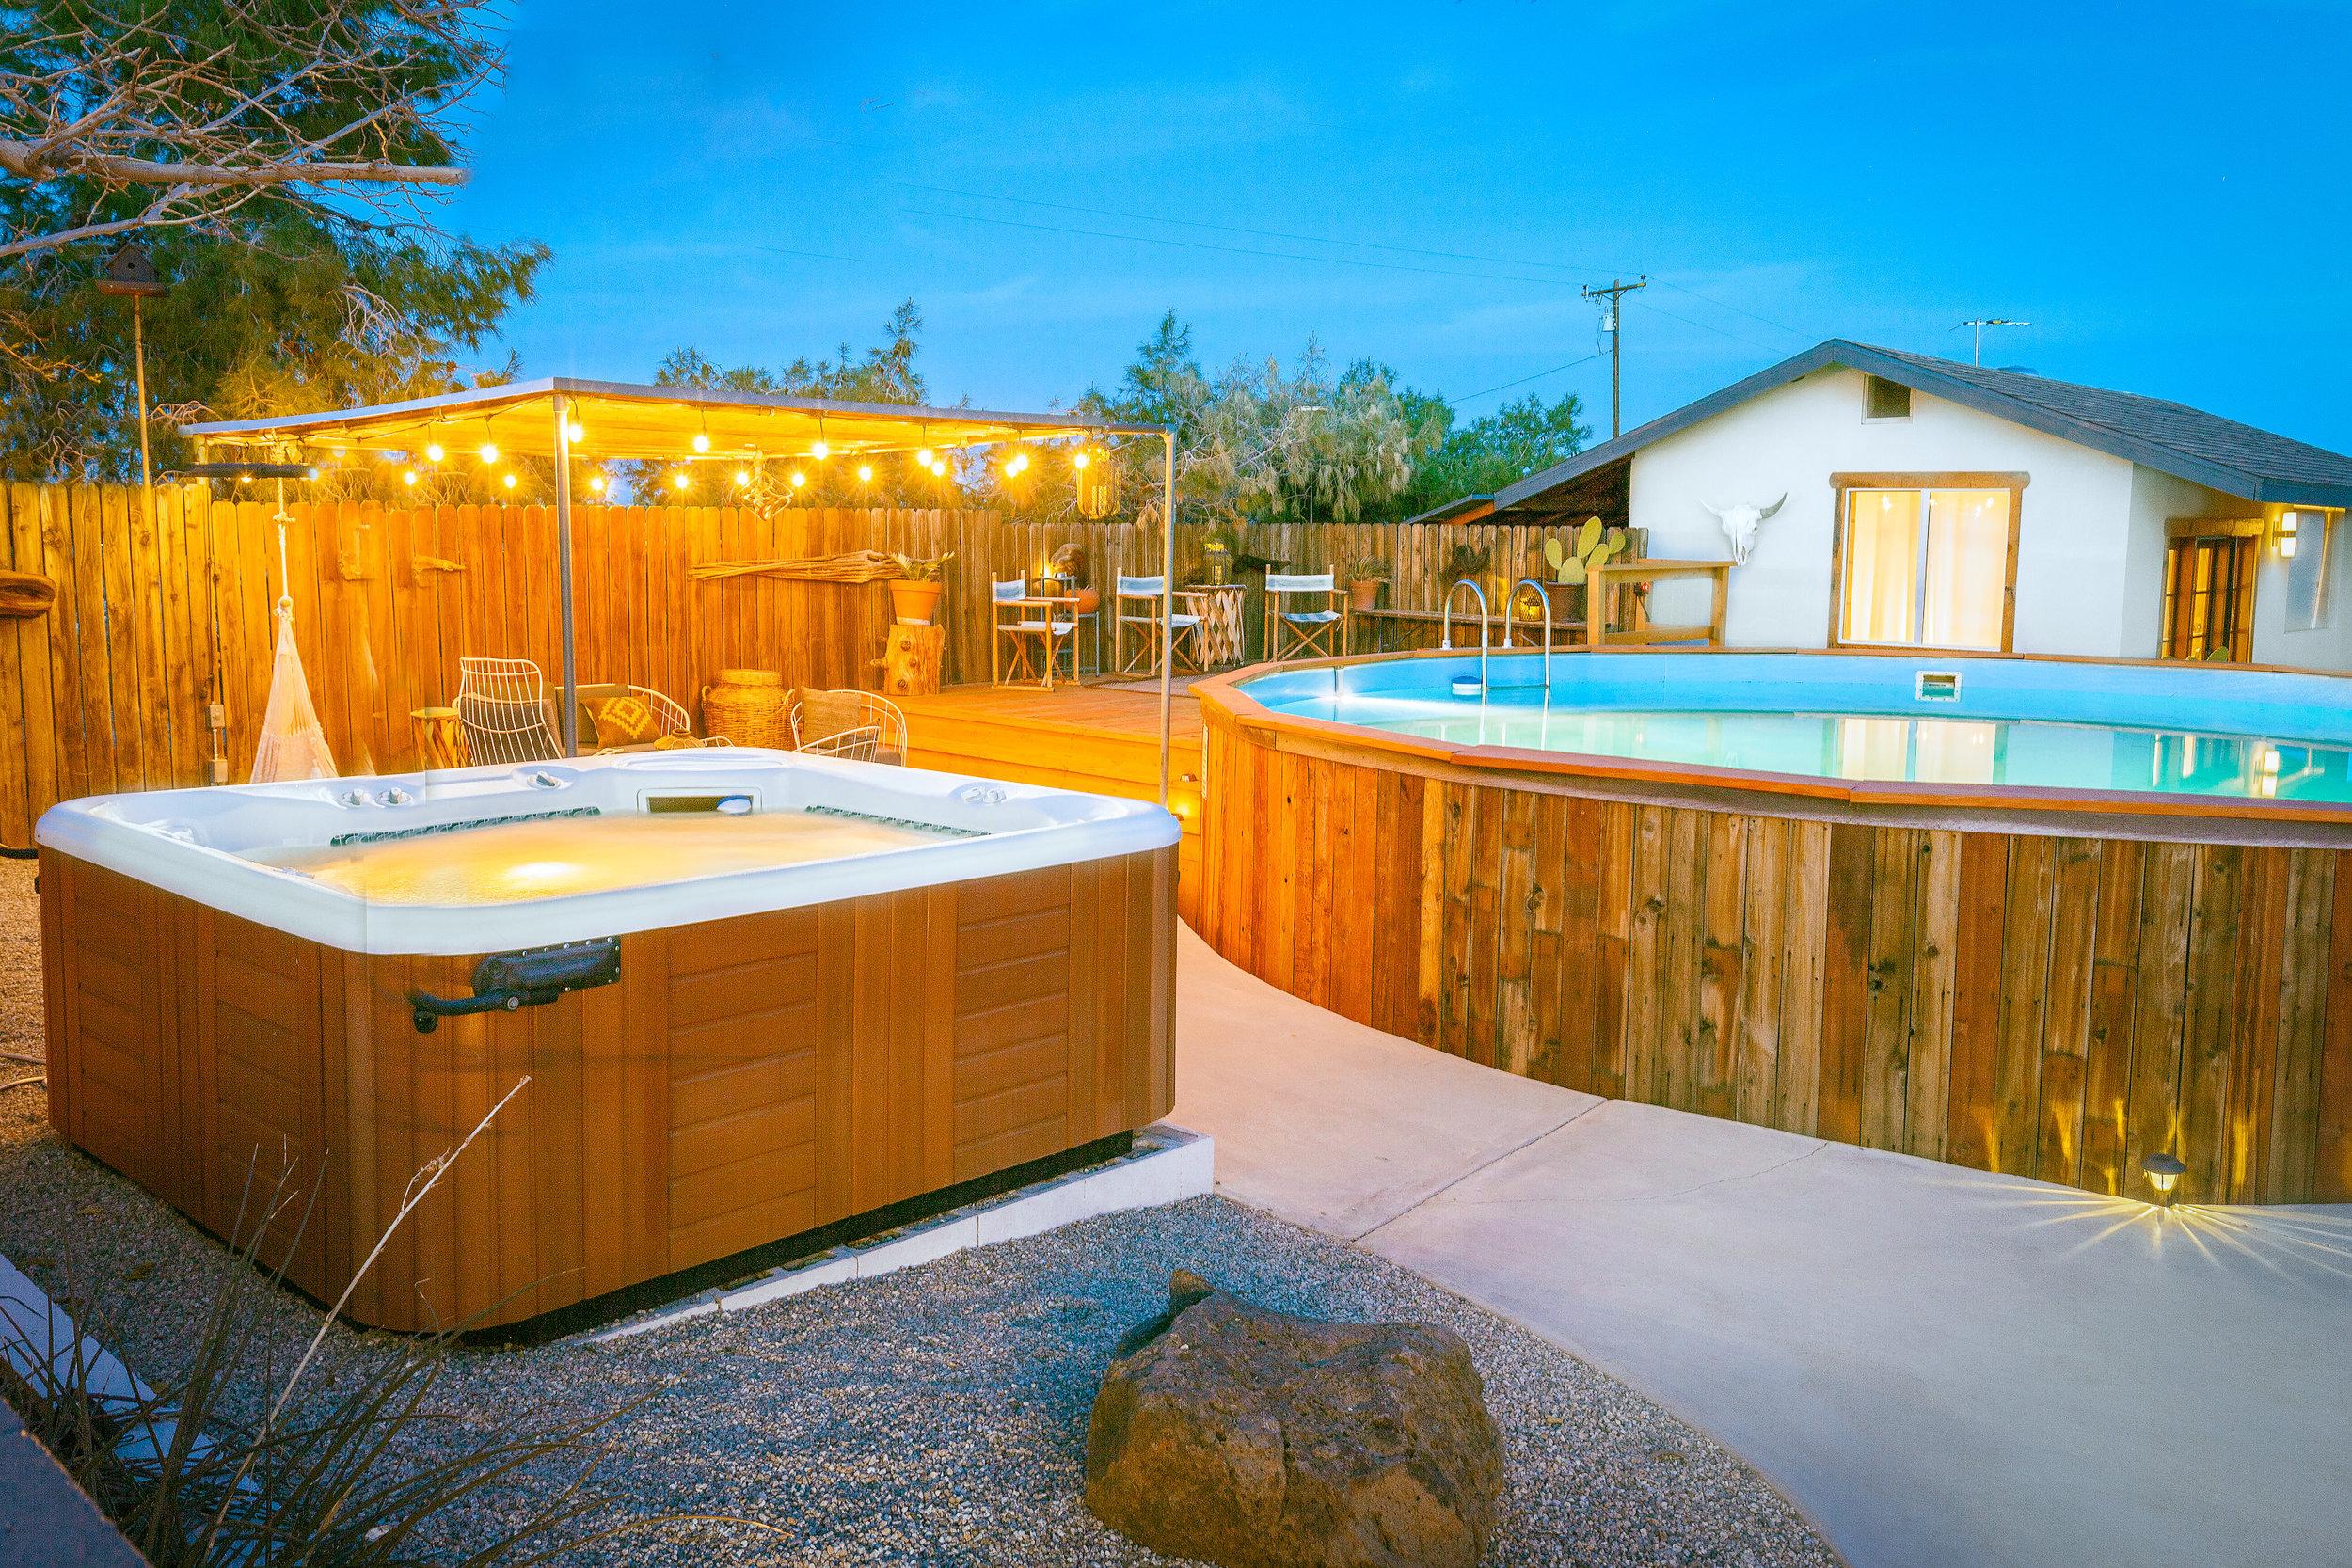 high-desert-pool-hot-tub.png